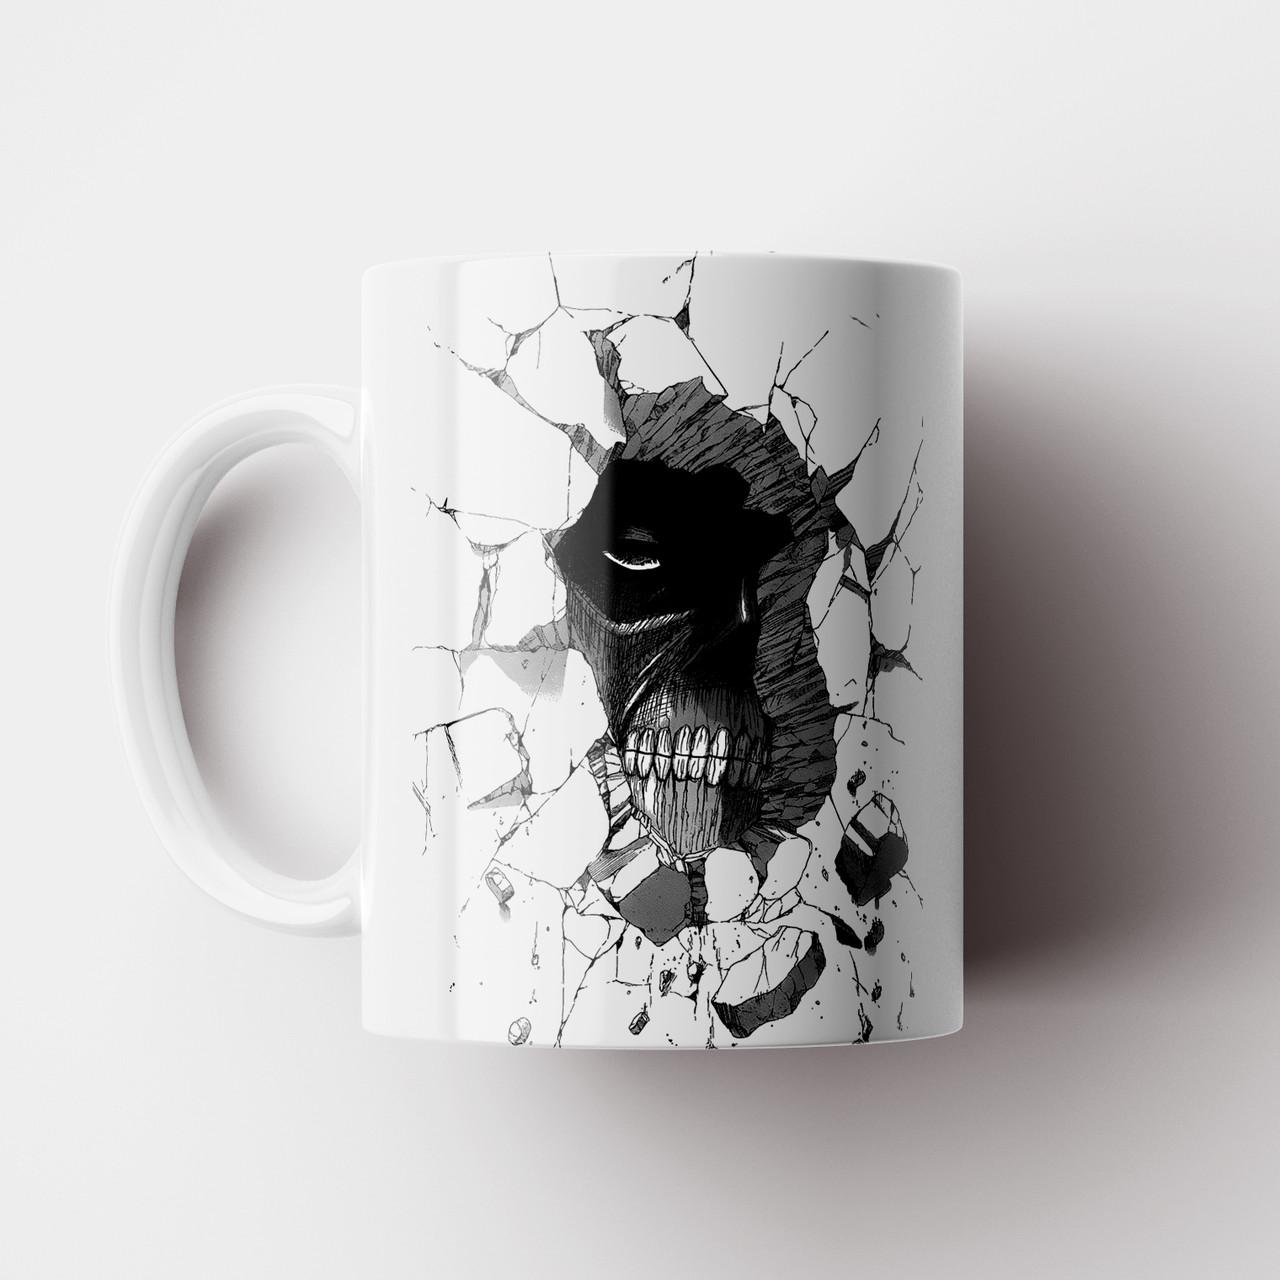 Кружка с принтом Атака Титанов. Attack on Titan v8. Чашка с фото